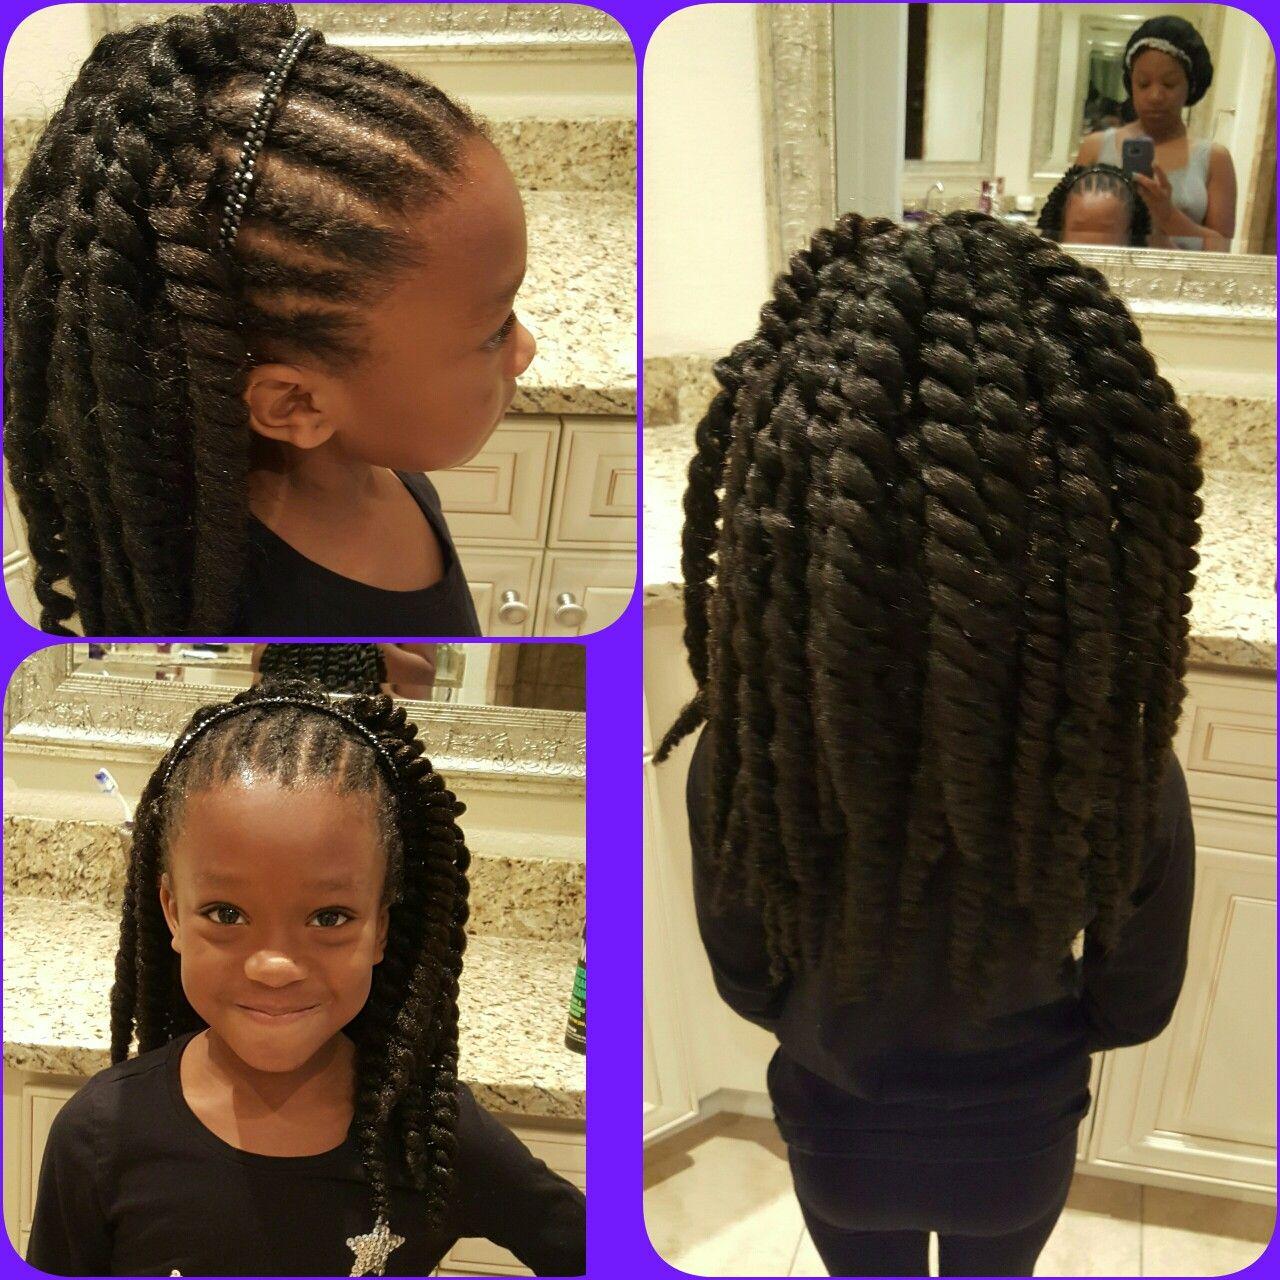 Little Girl Crochet With Cornrows Hair Styles Natural Hair